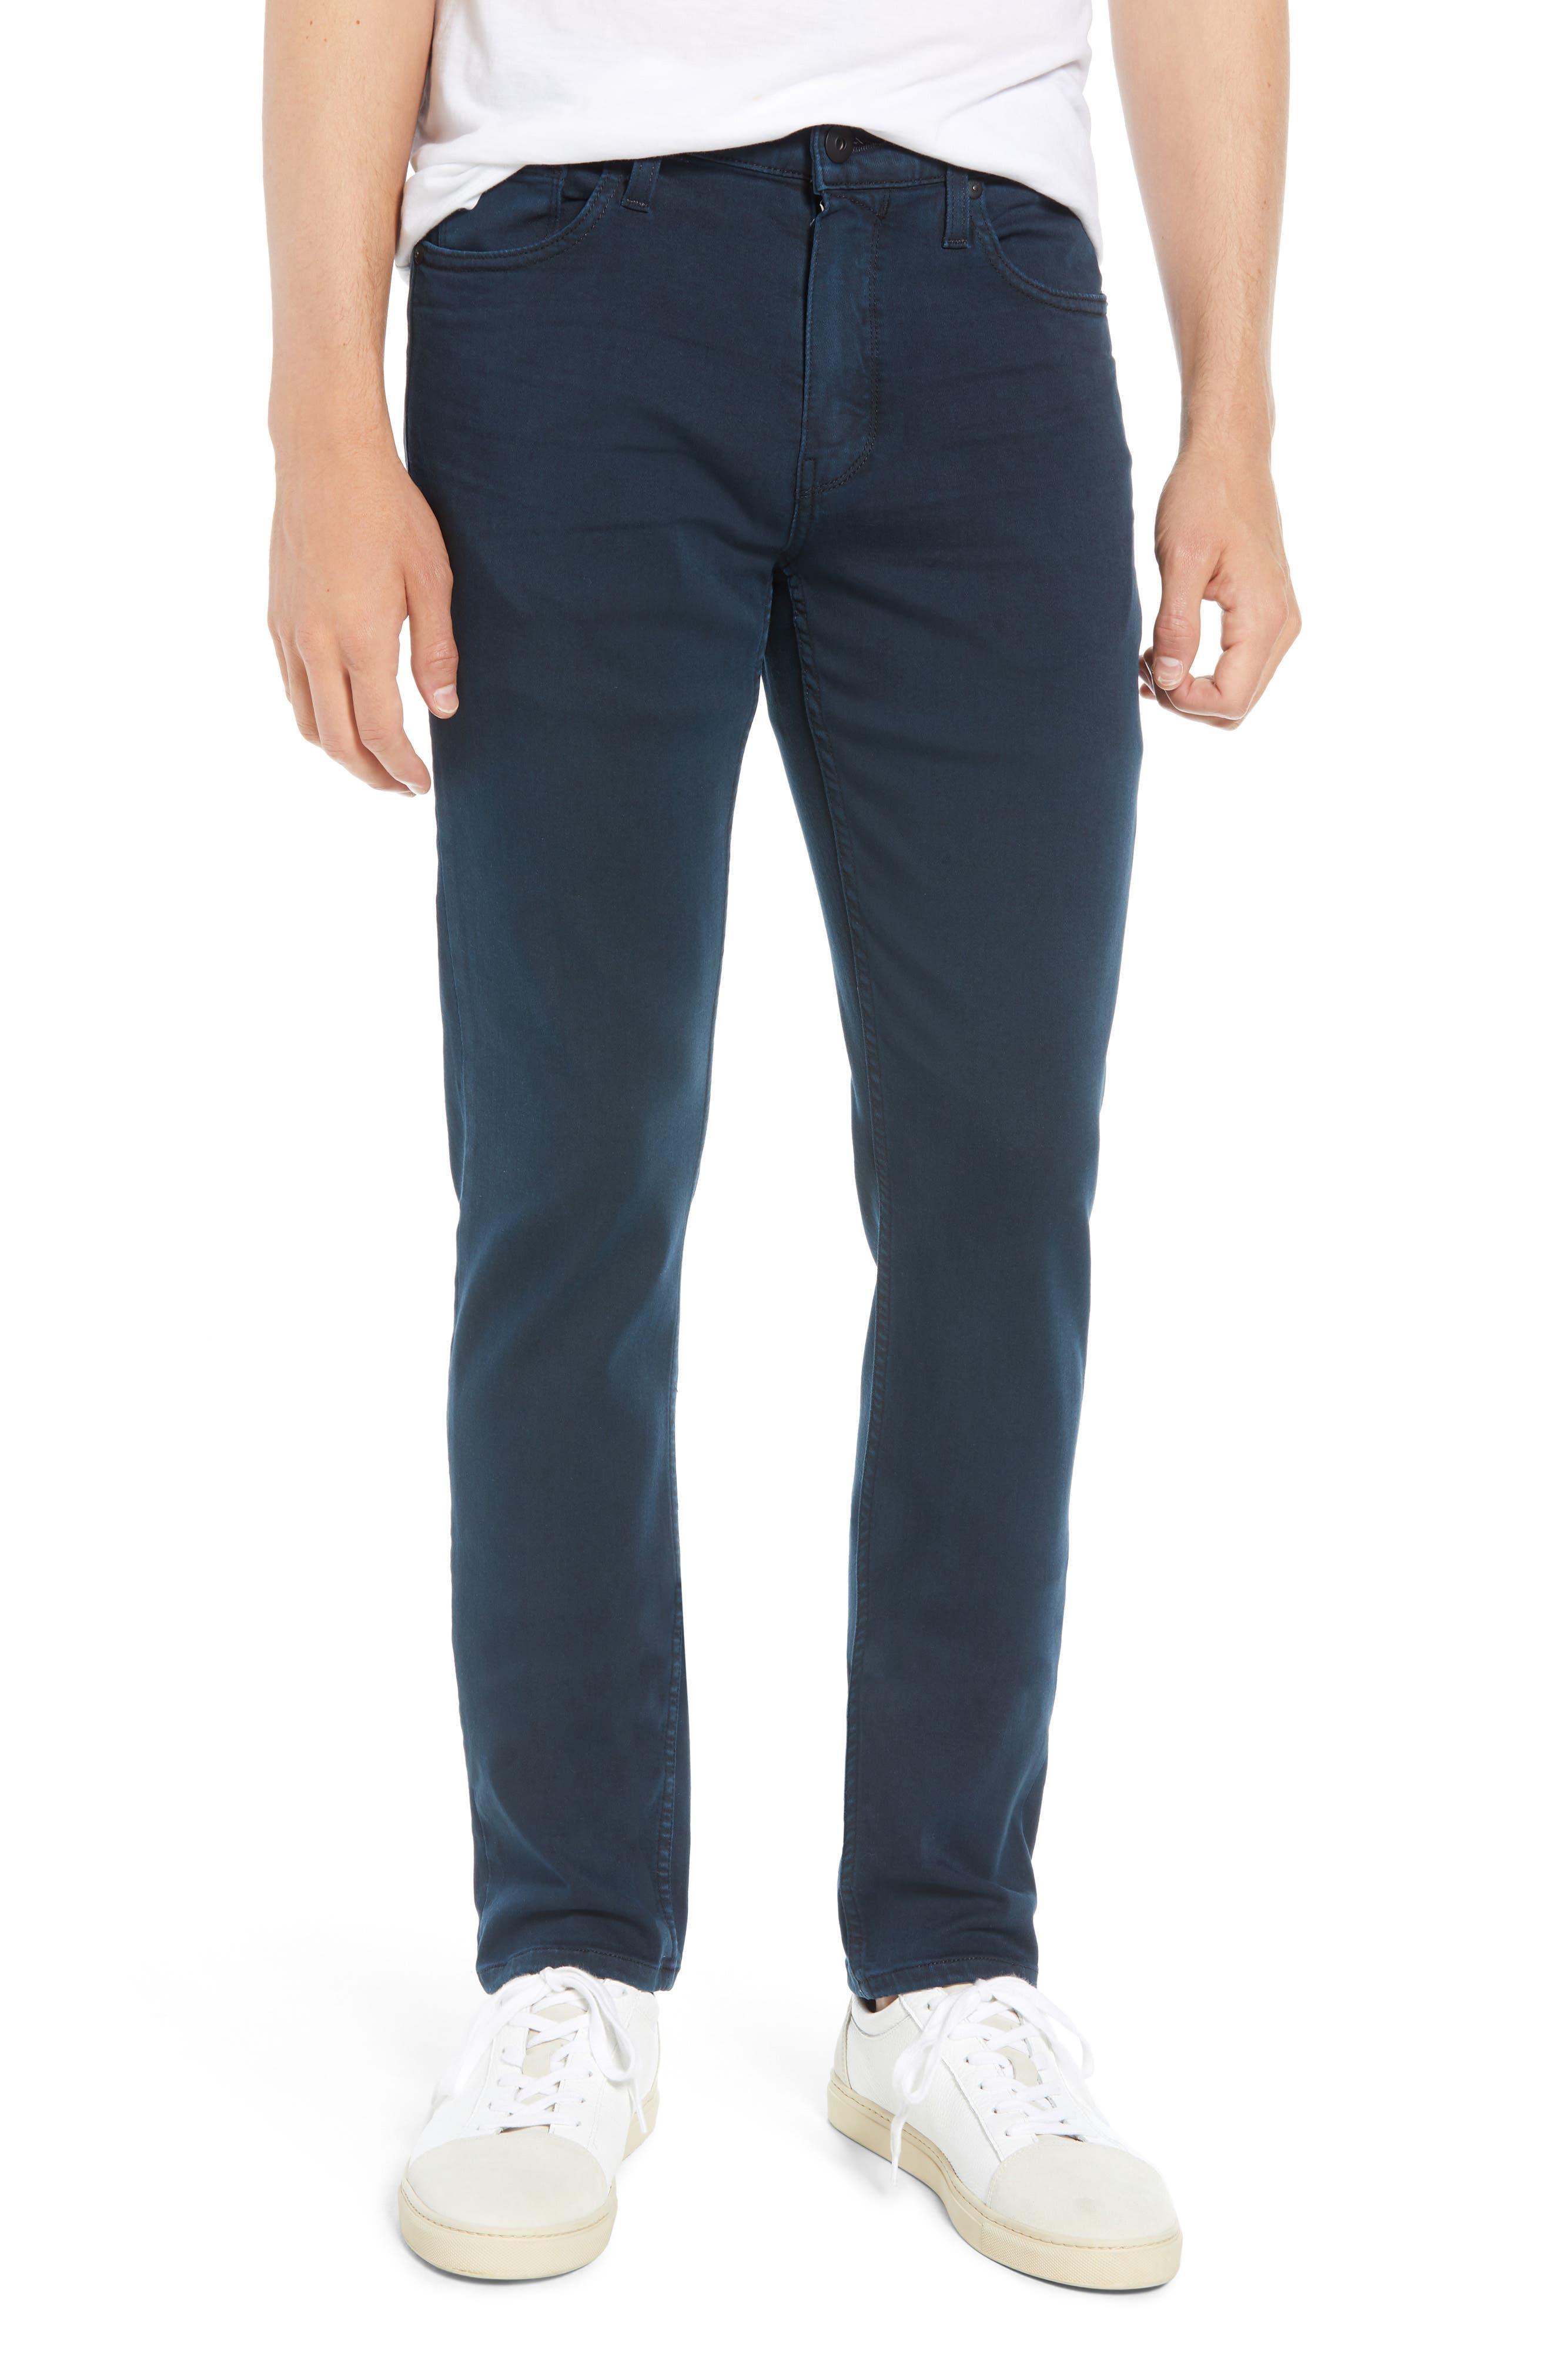 Transcend - Lennox Slim Jeans, Main, color, 401